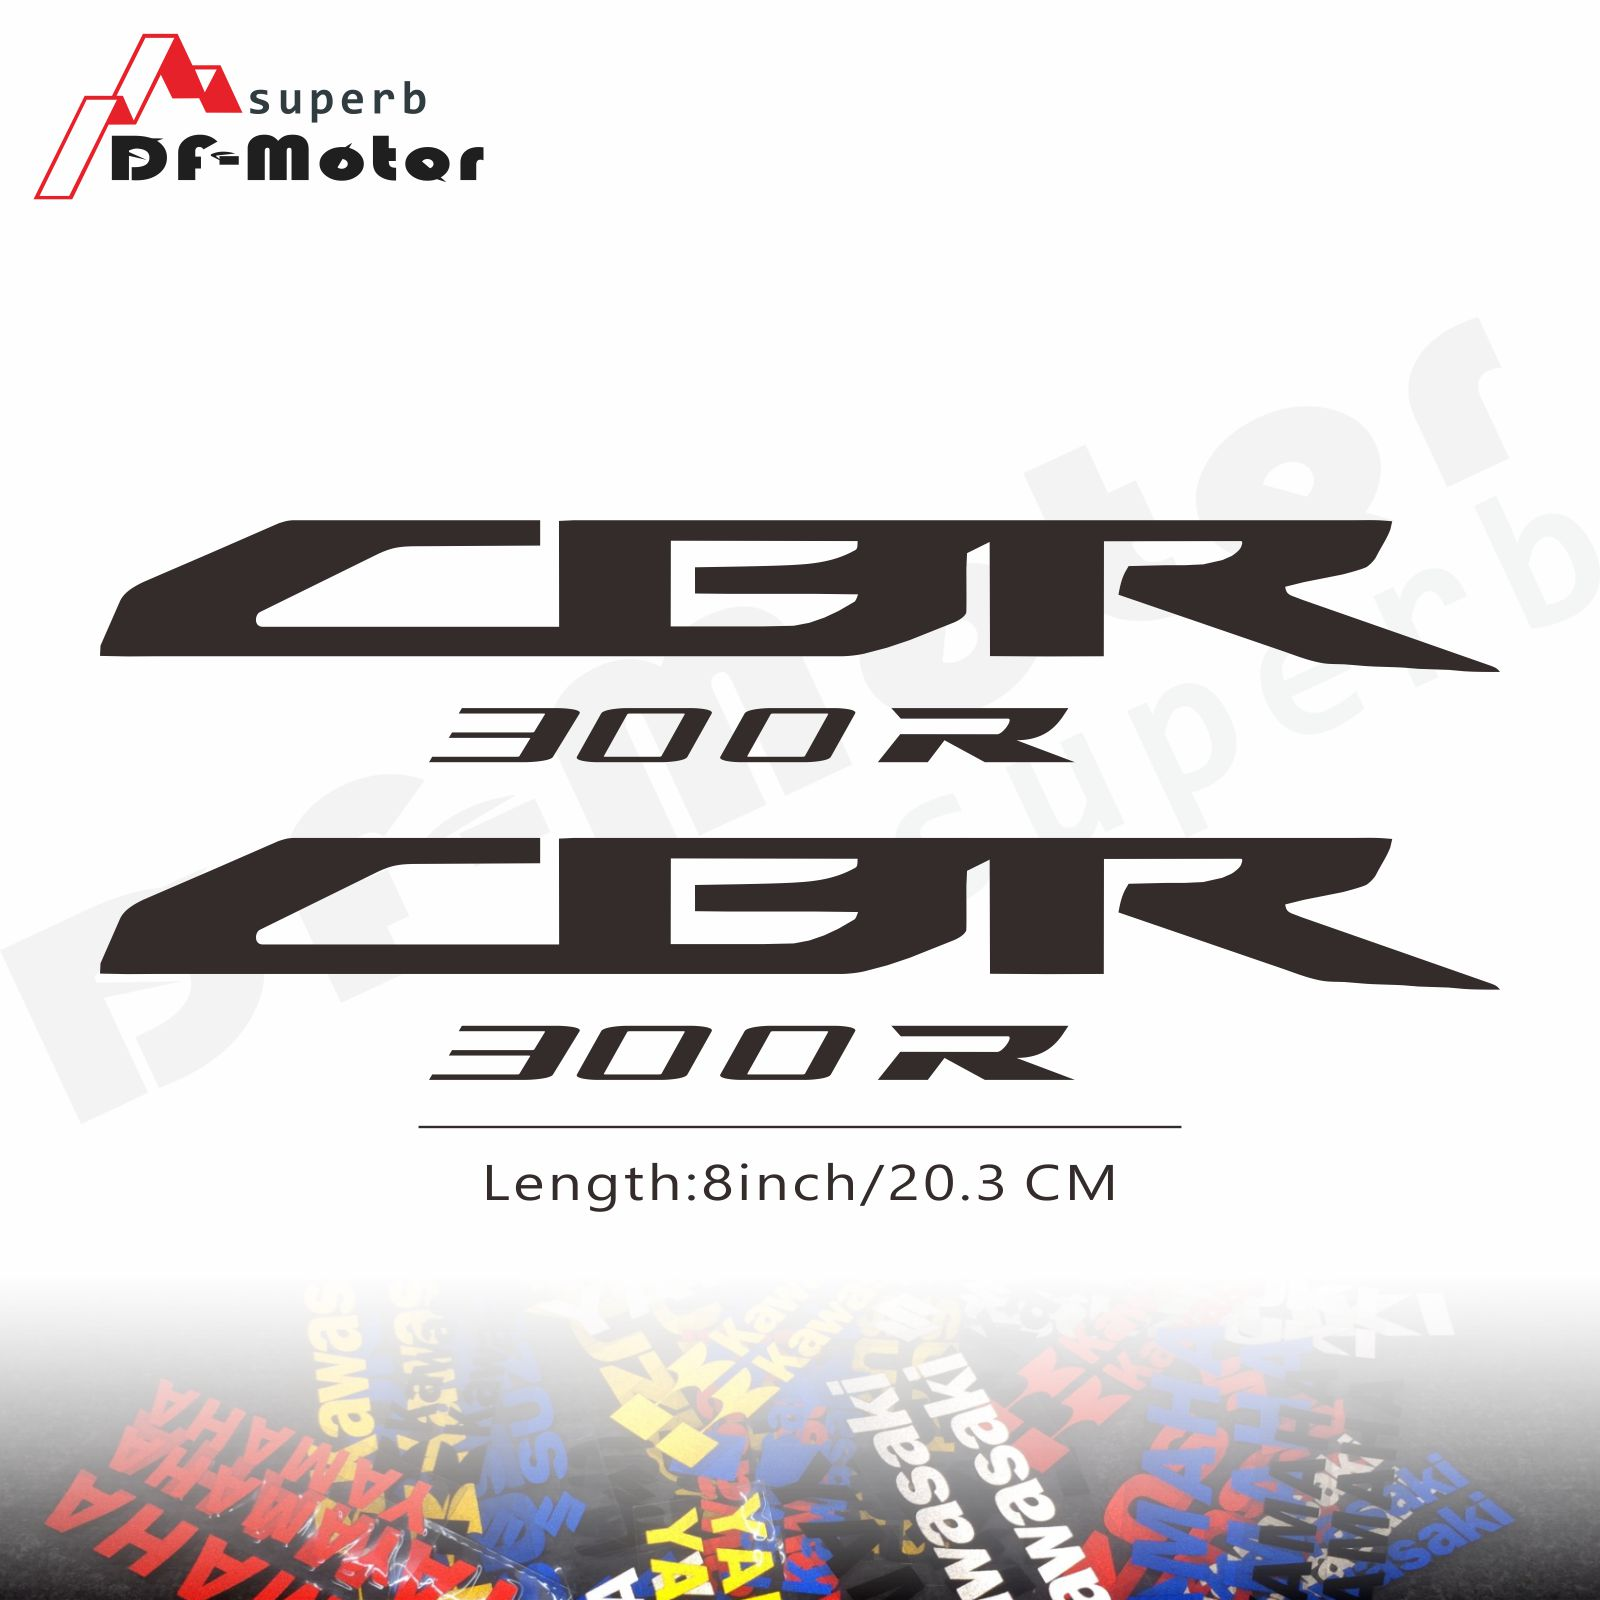 8Inch Reflective Sticker Decal Motorcycle Car Sticker Wheels Fairing Helmet Sticker Decal For Honda CBR300R CBR 300 R